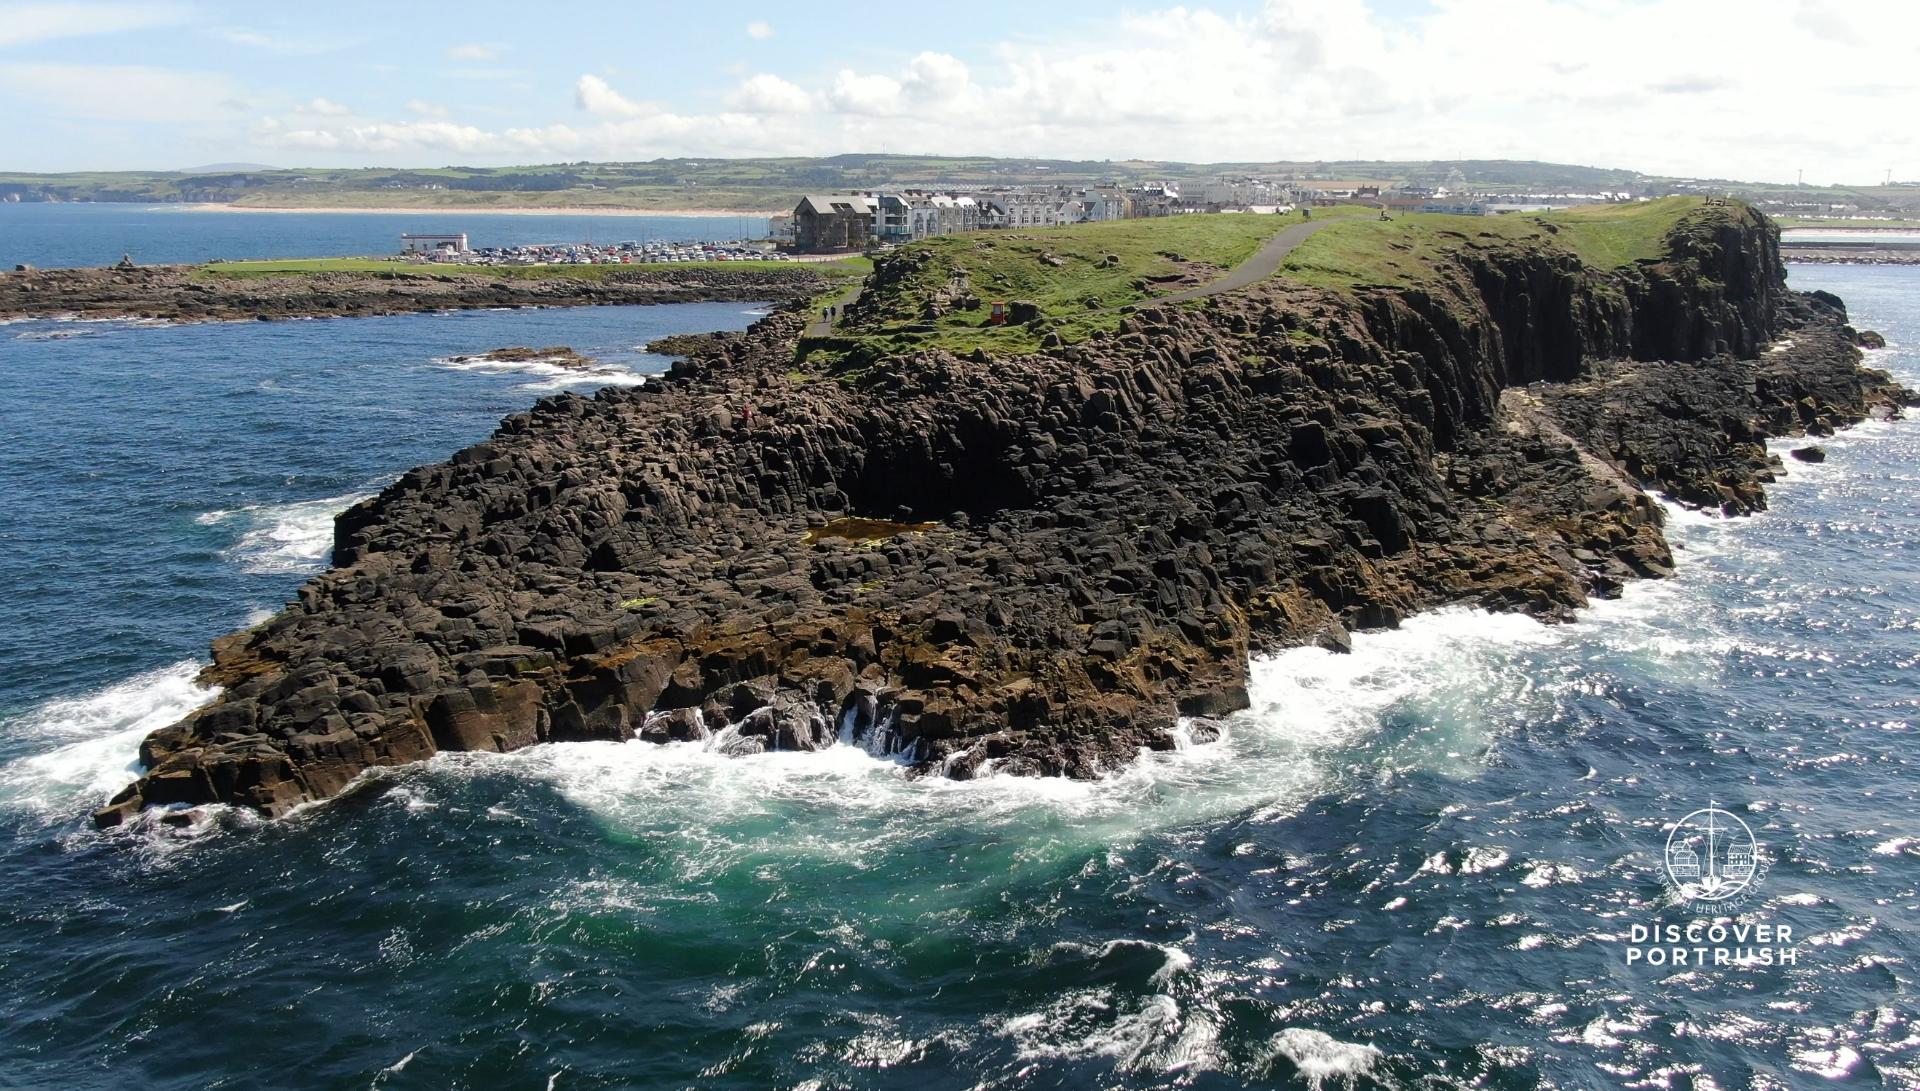 Ramore Head, Portrush